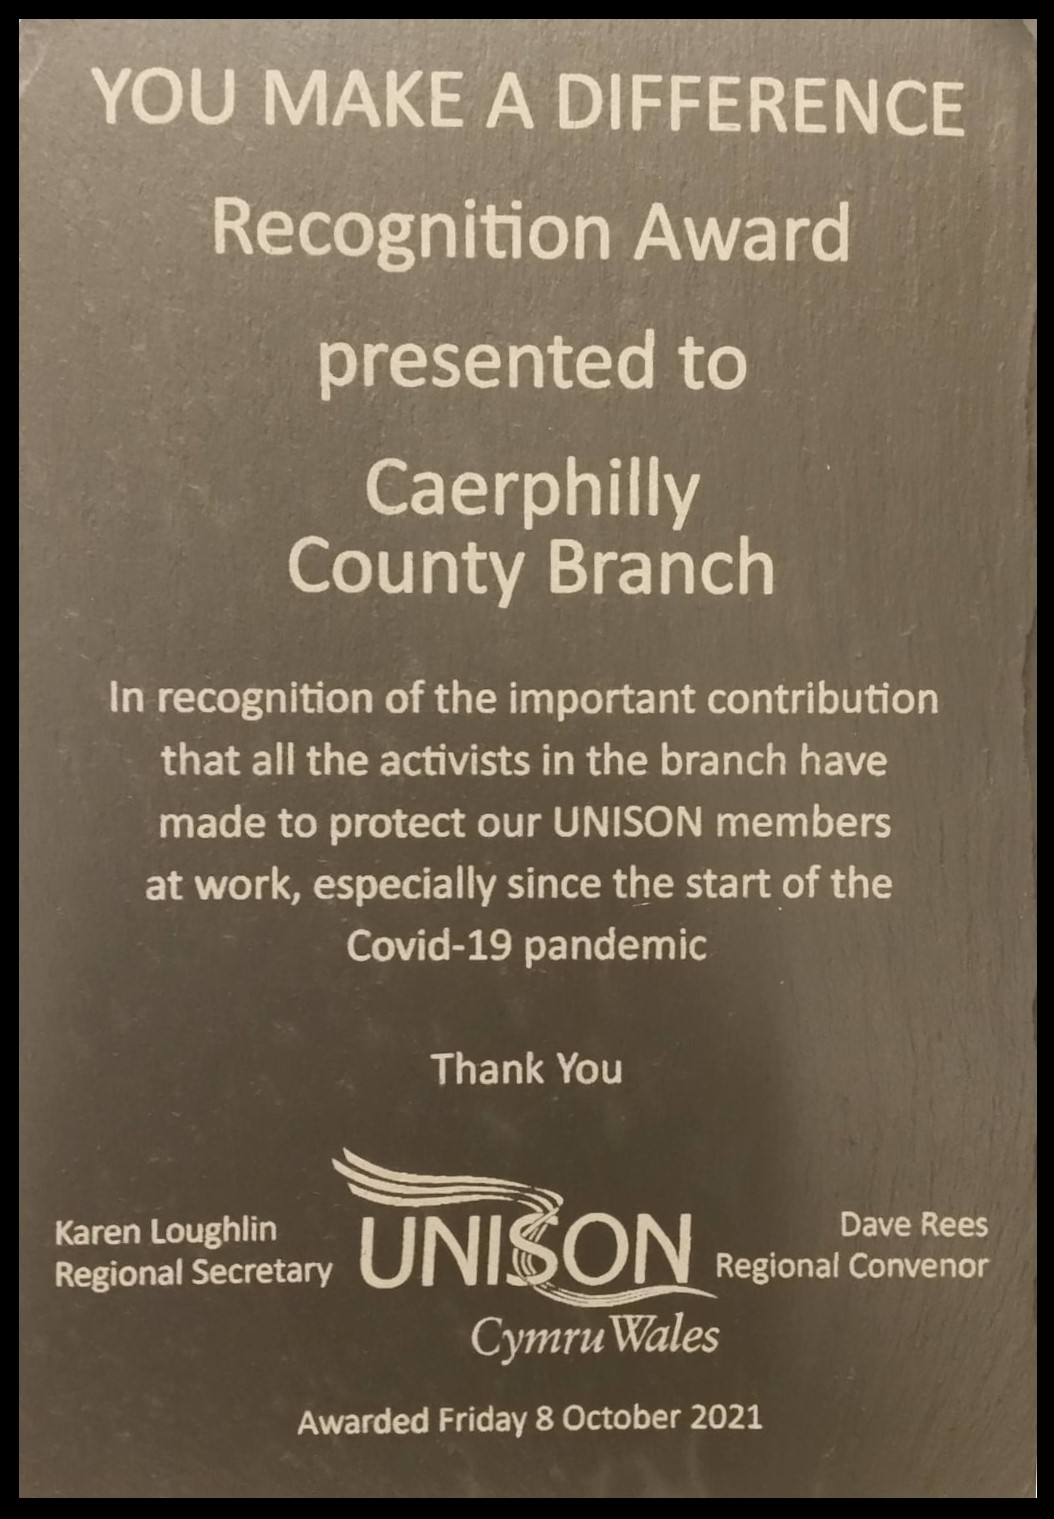 Caerphilly Branch Award 2021